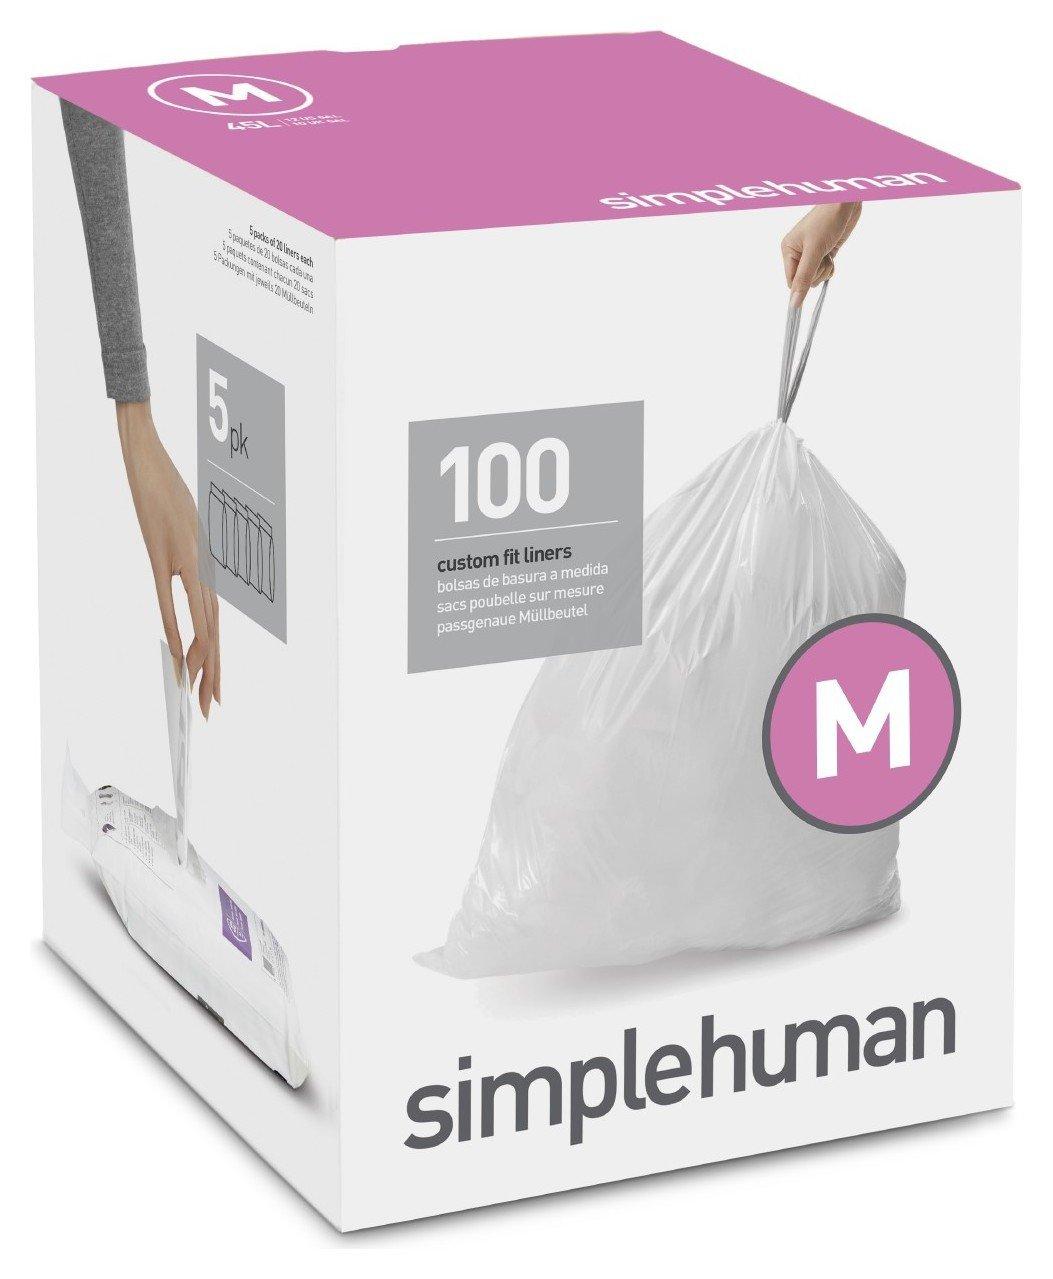 simplehuman Bin Liner Code M x 100 Liners